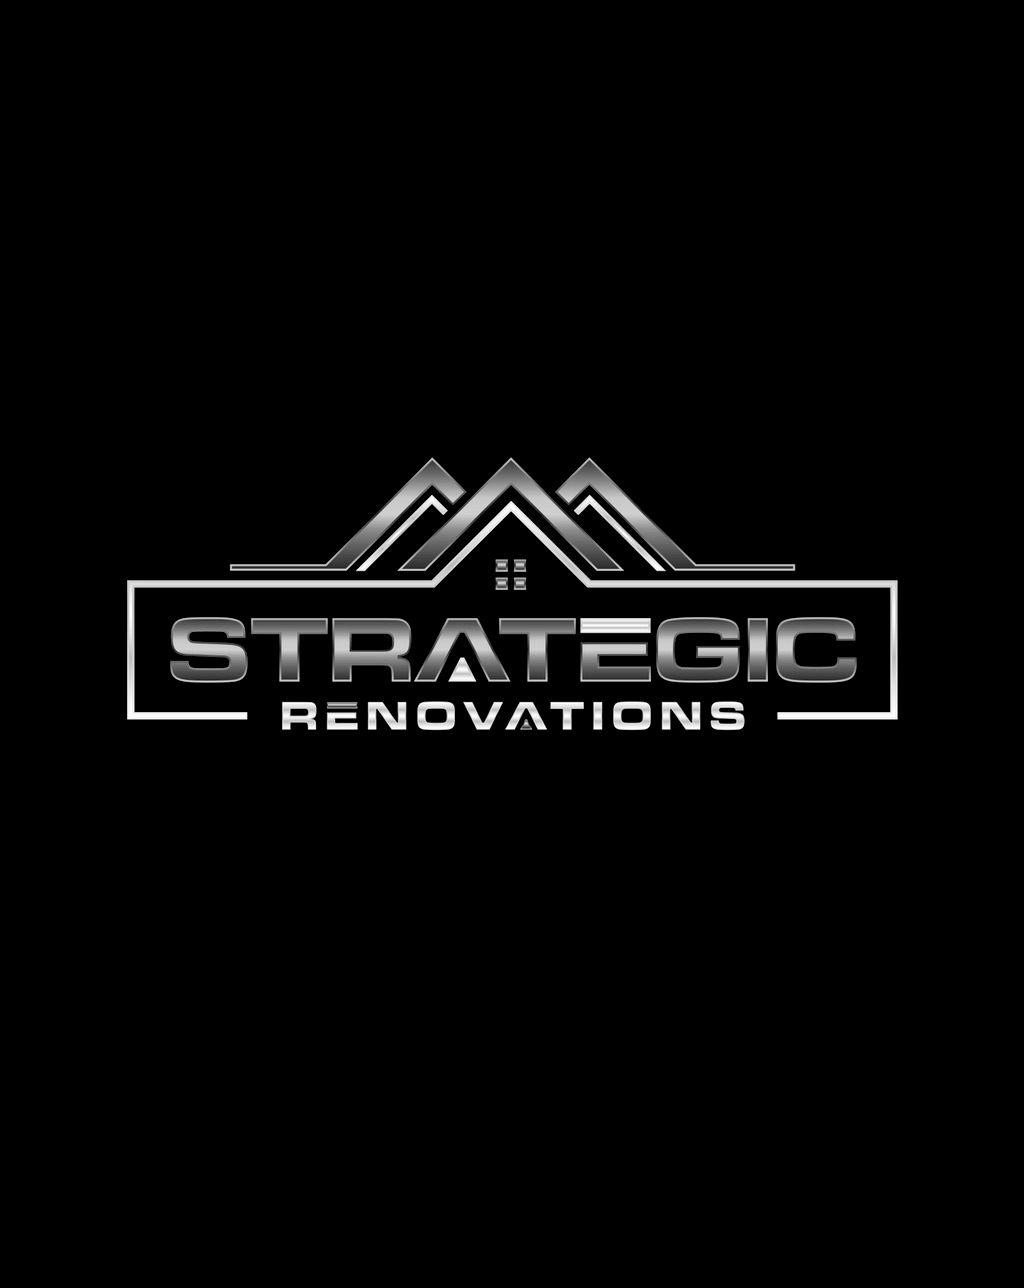 Strategic Renovations LLC